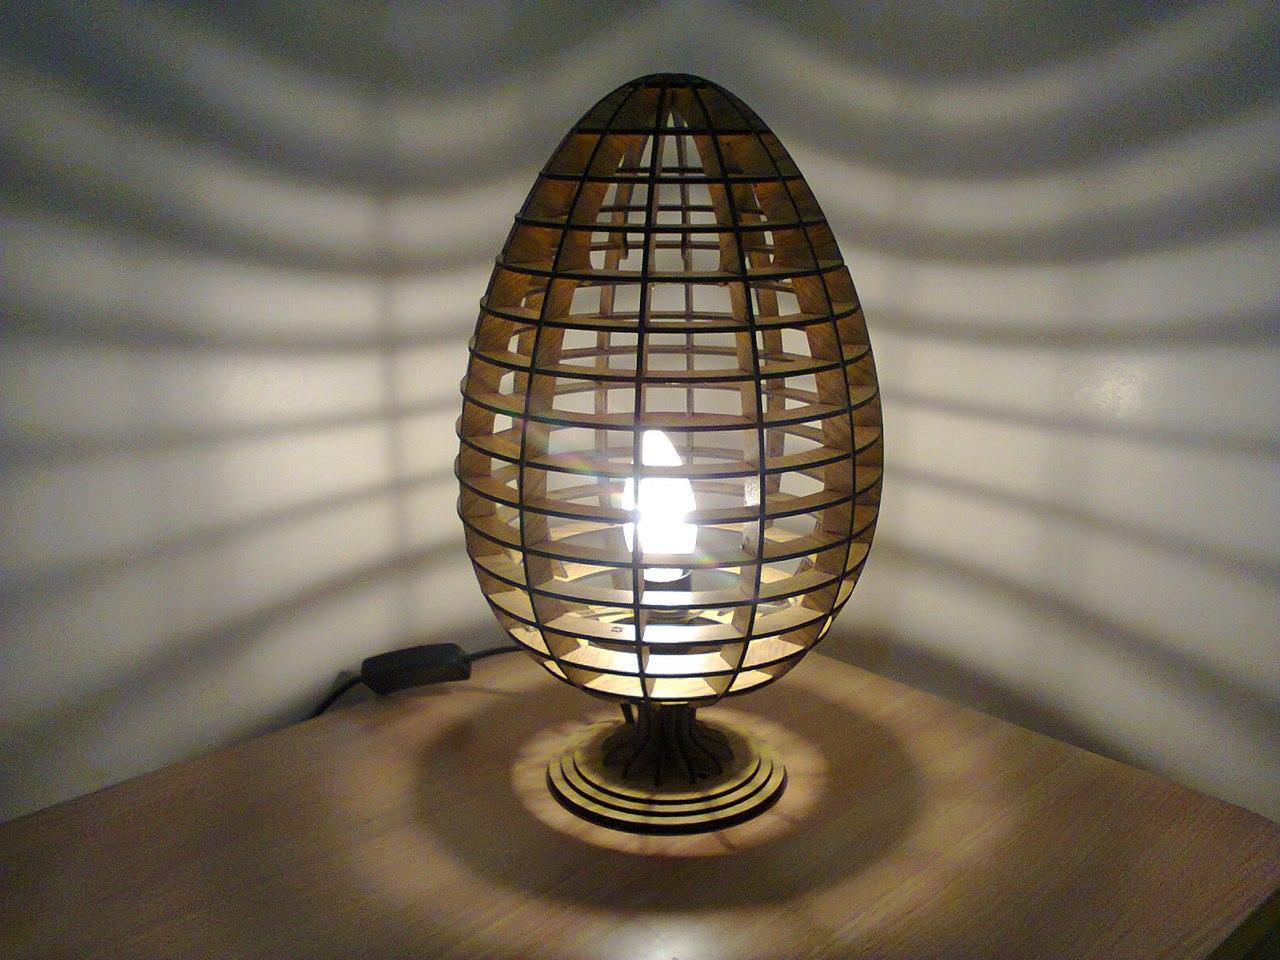 Lampa Smert Koscheeva Free CDR Vectors Art